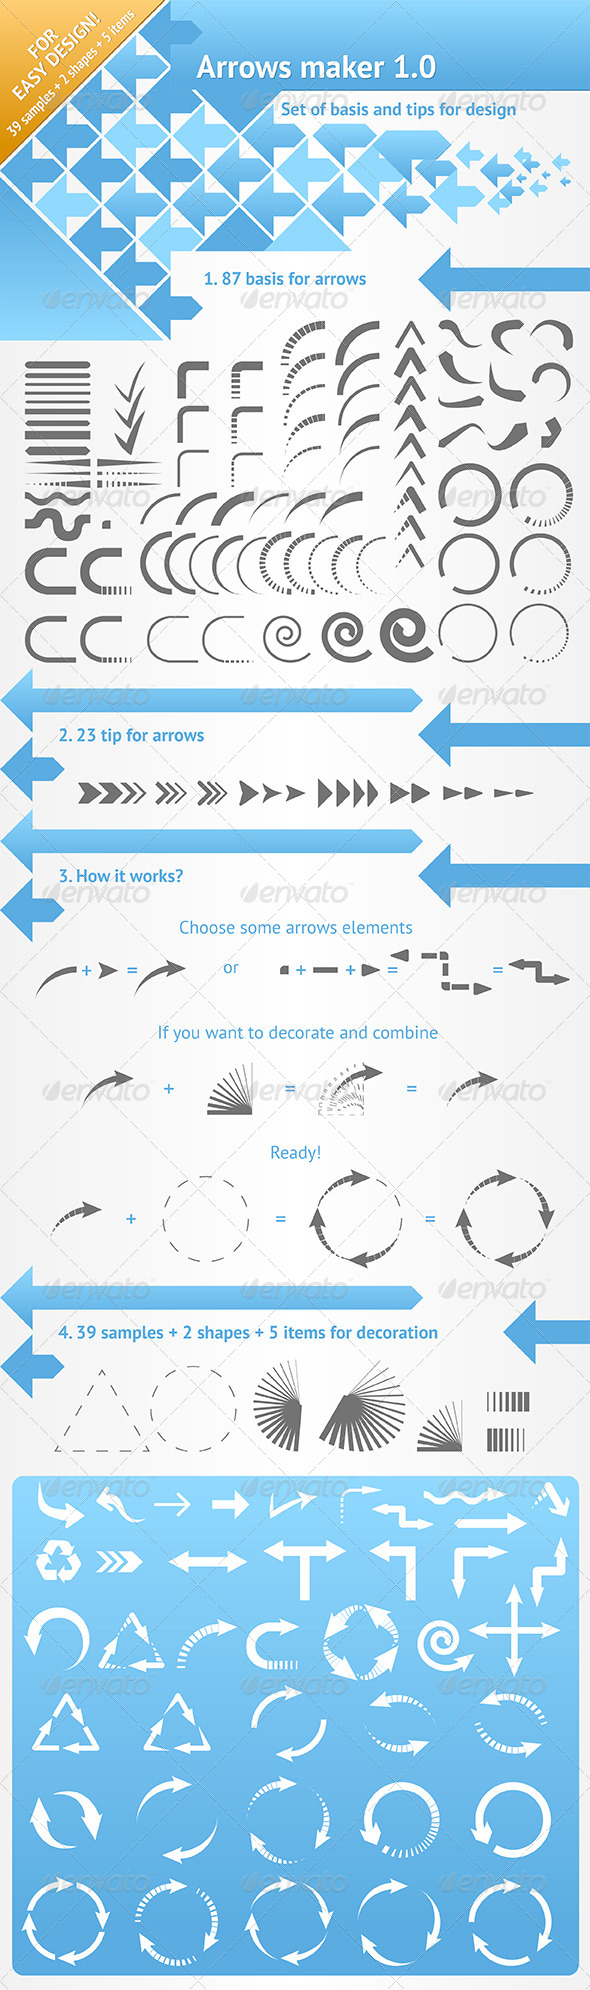 Arrows Maker 1.0